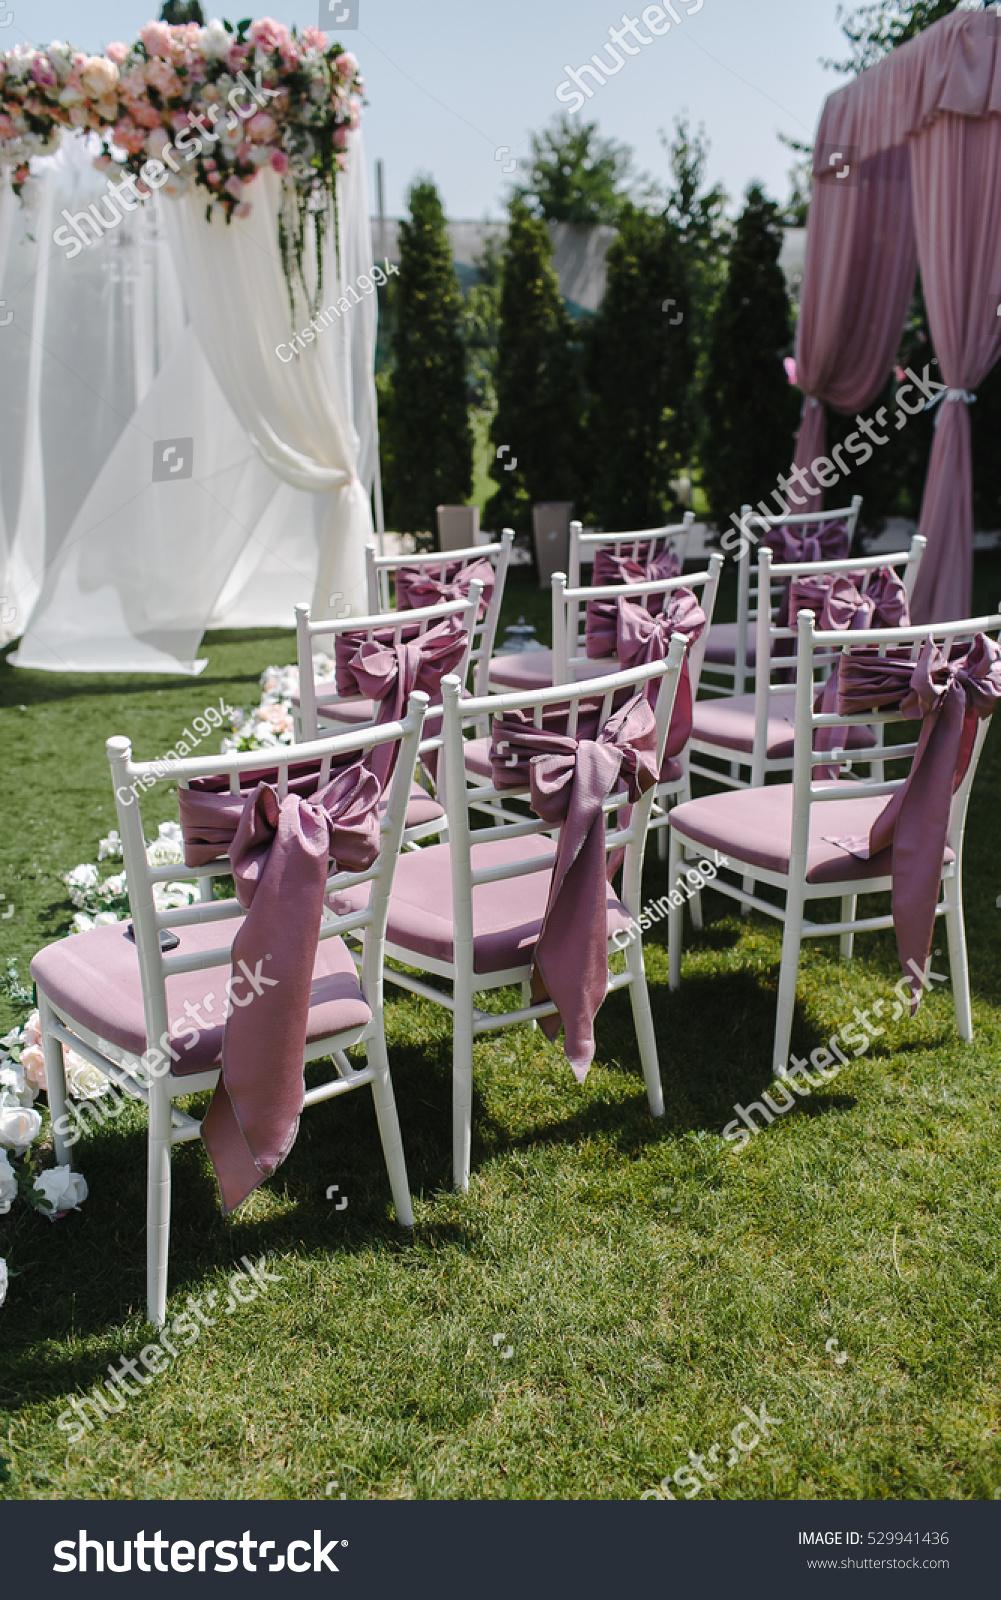 Simple Decor Wedding Many Pink White Stock Photo Edit Now 529941436